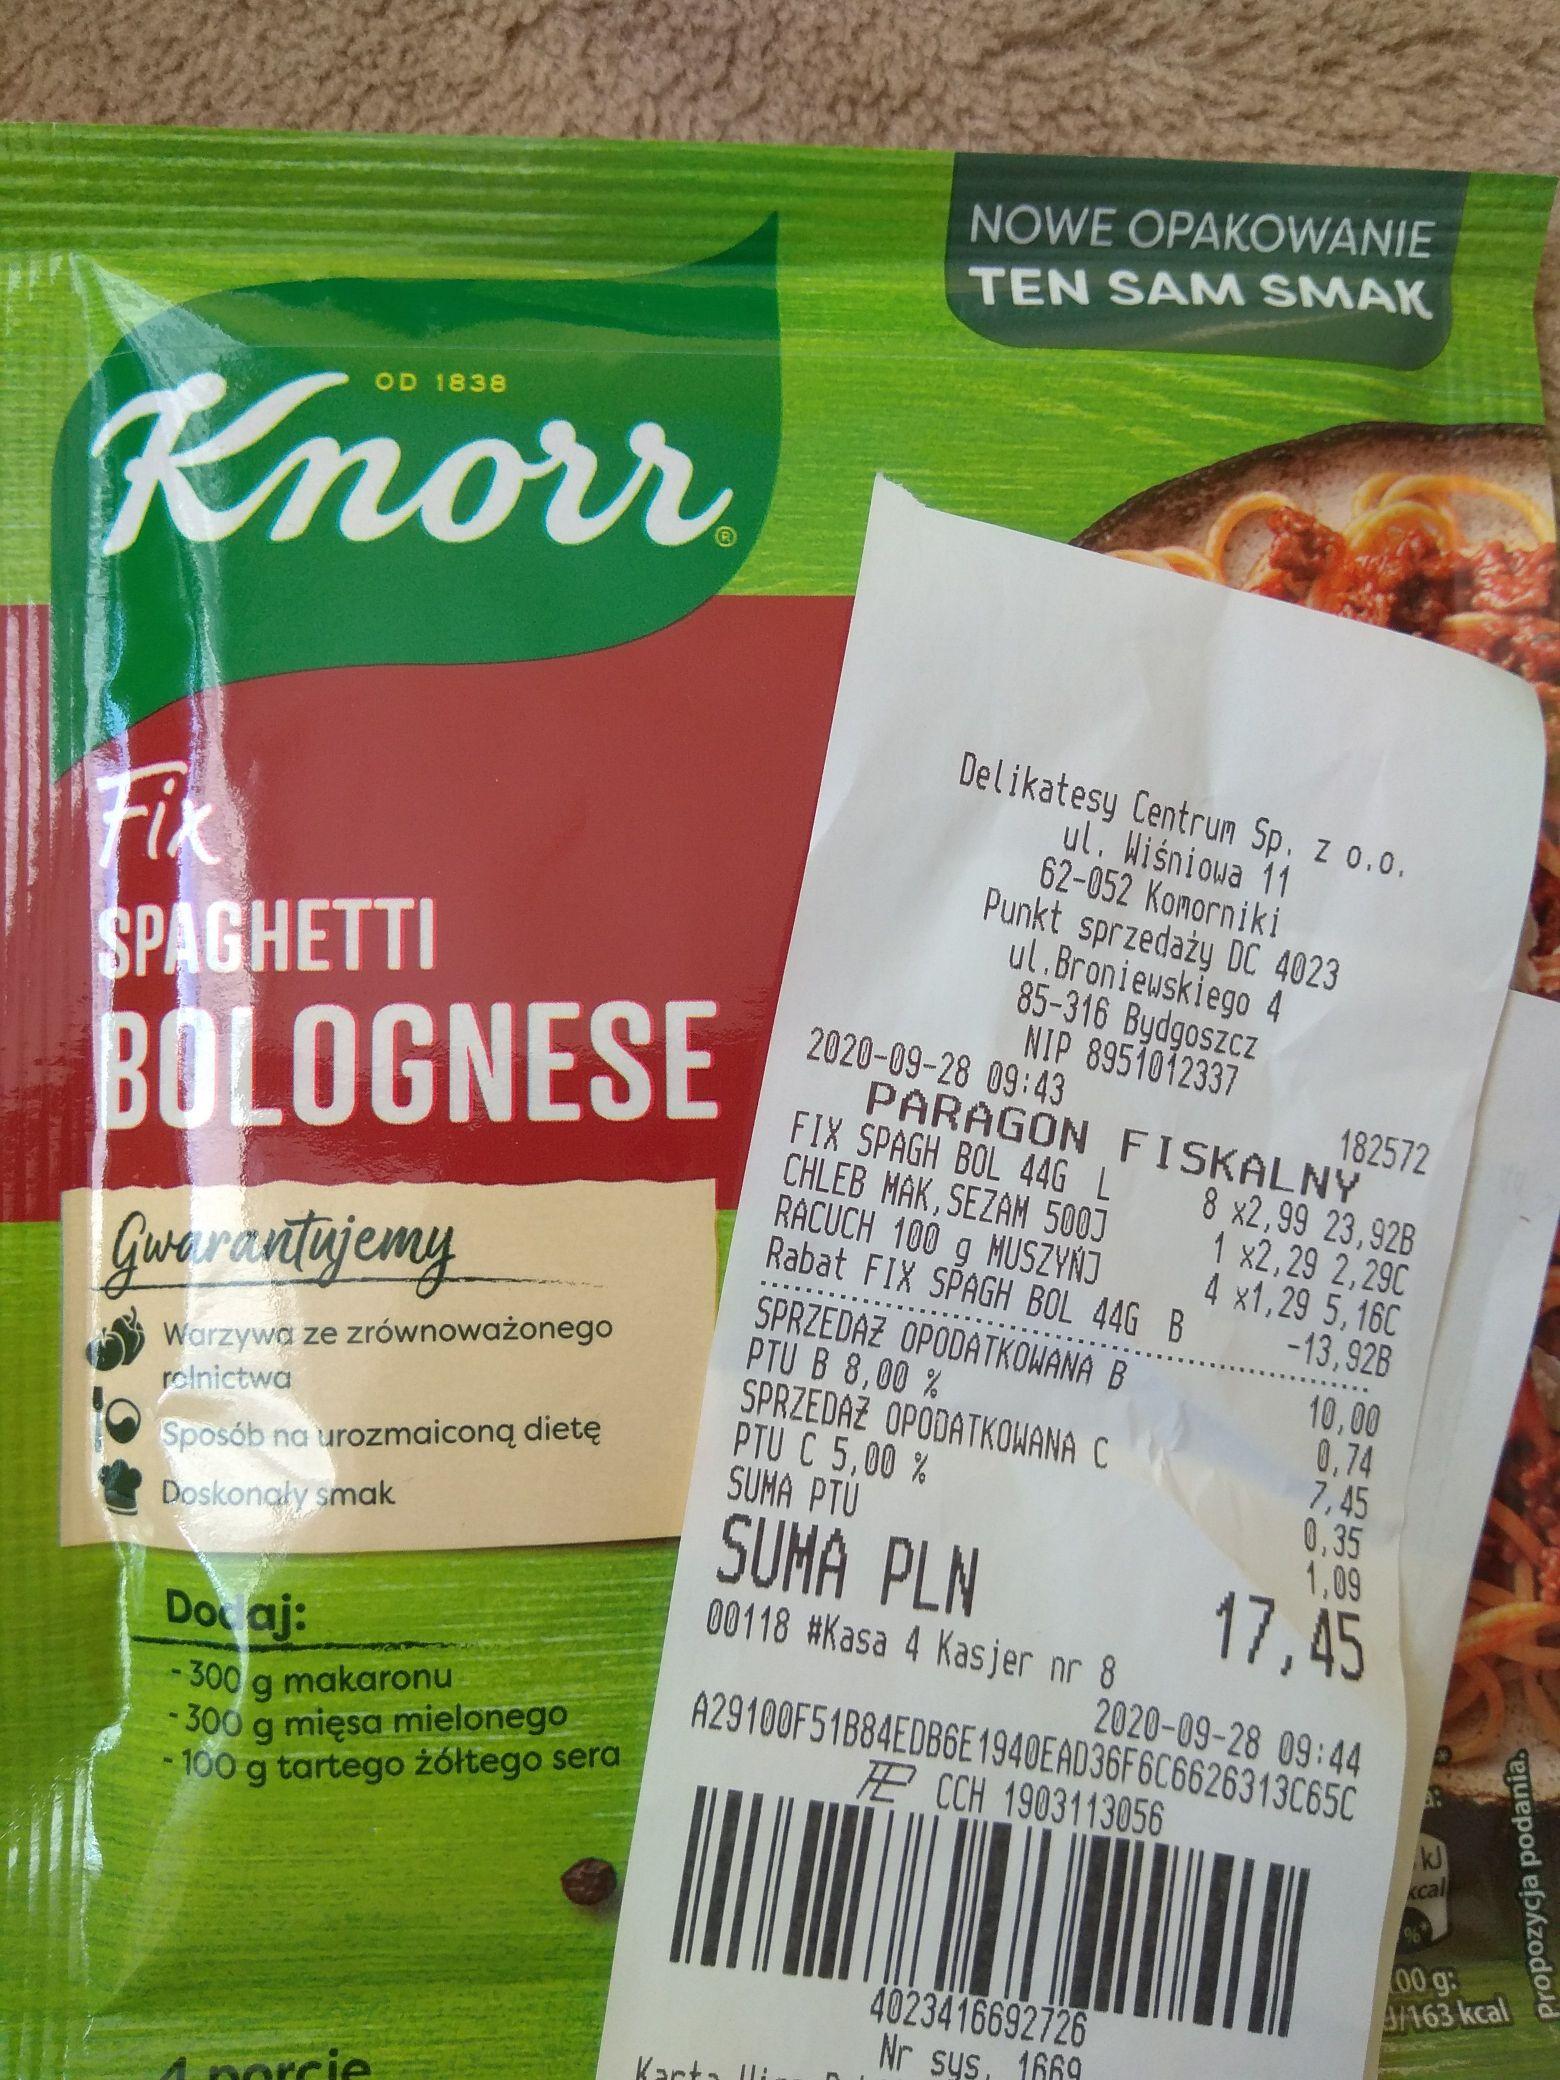 Delikatesy Centrum. Fix Knorr spaghetti bolognese.